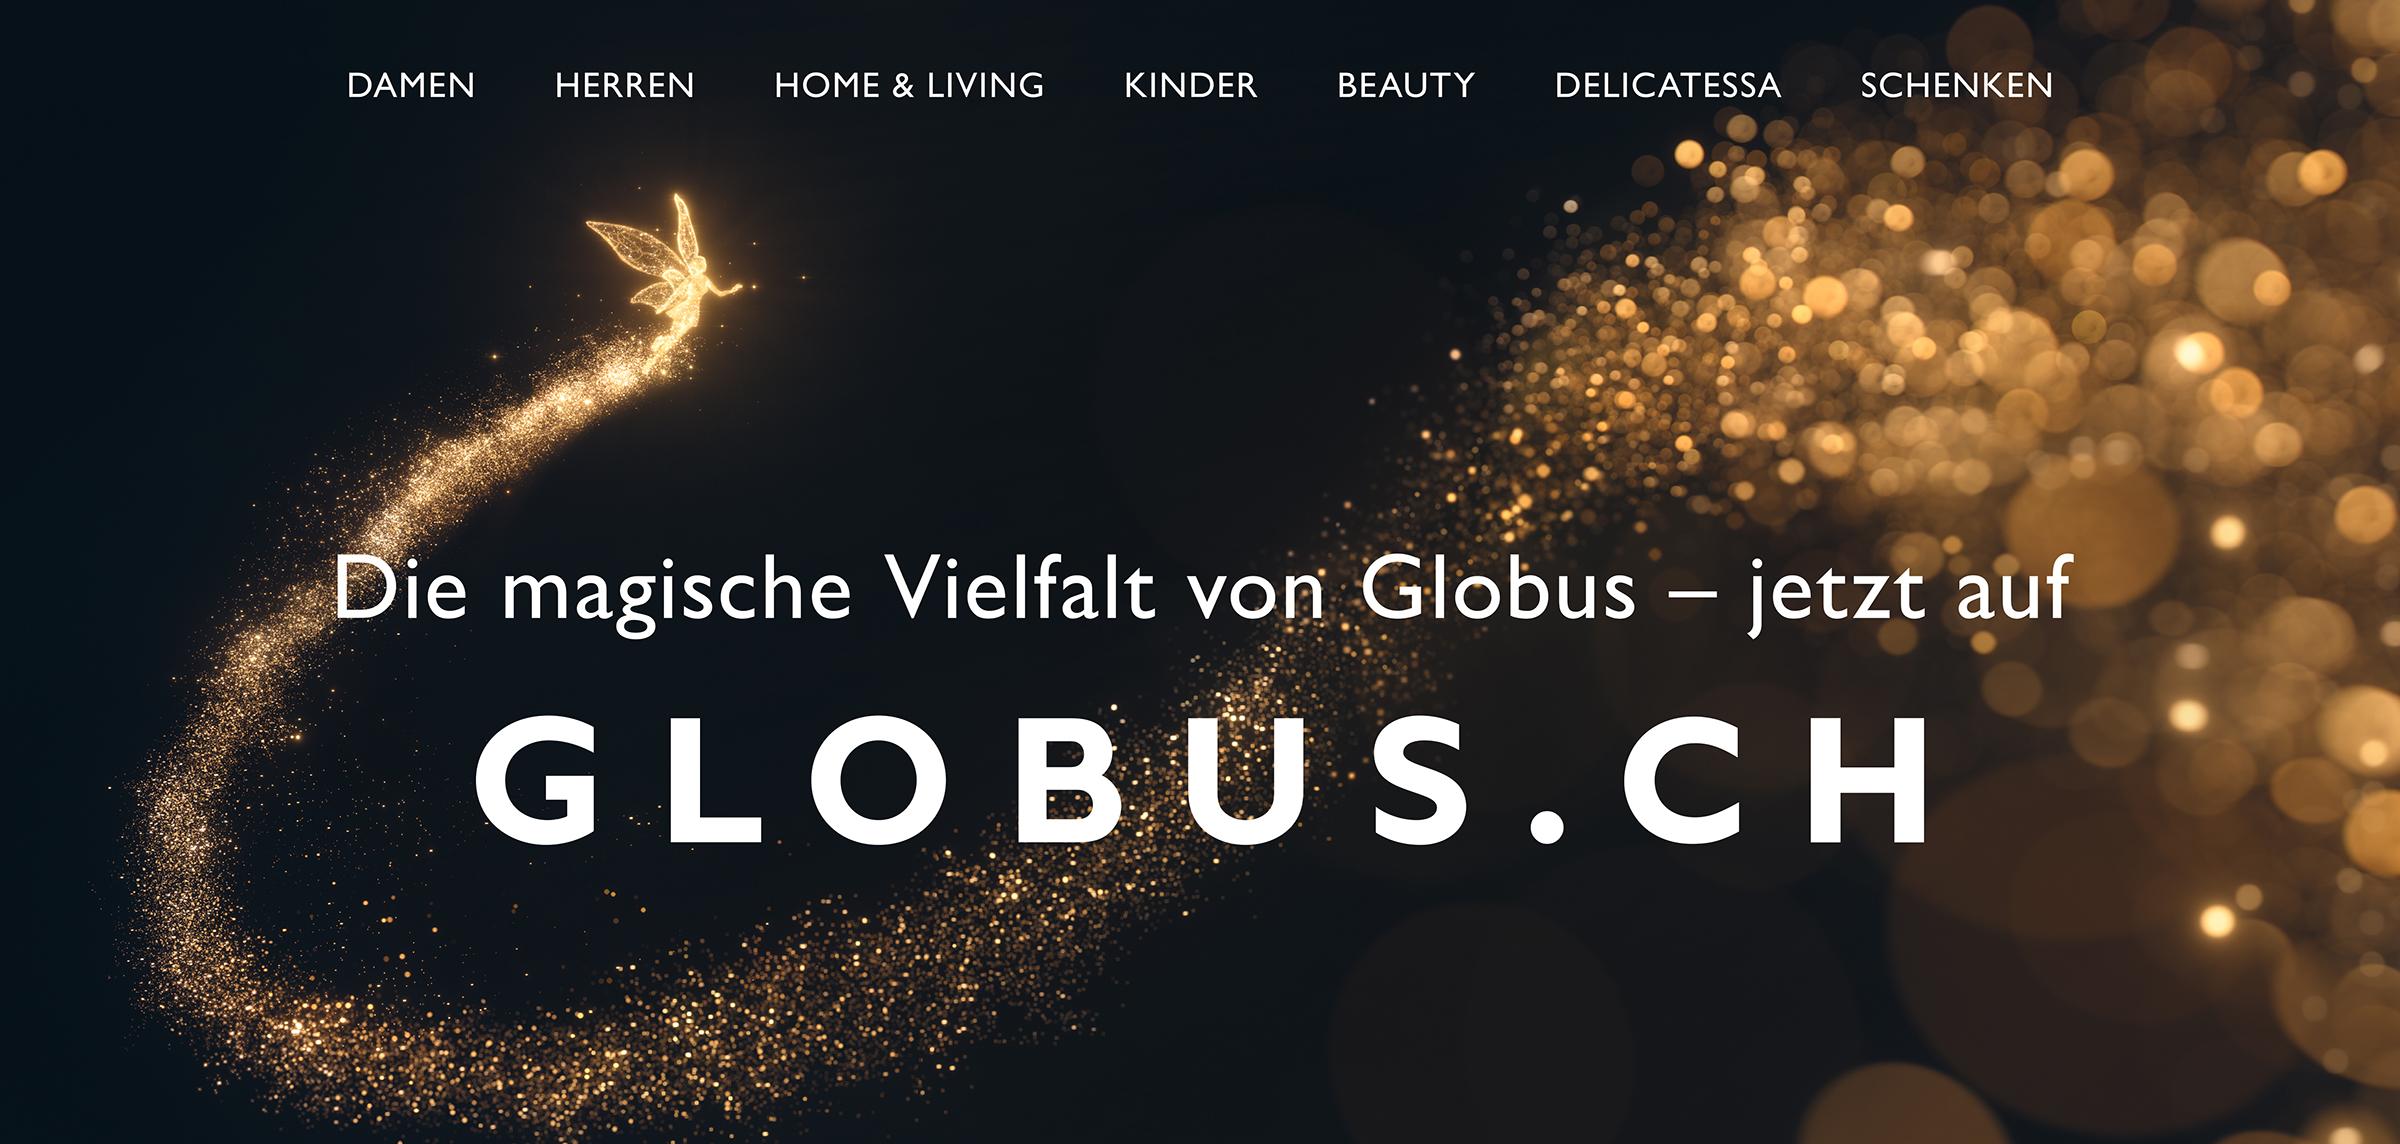 strobel_martin_globus_magicalchristmas_04